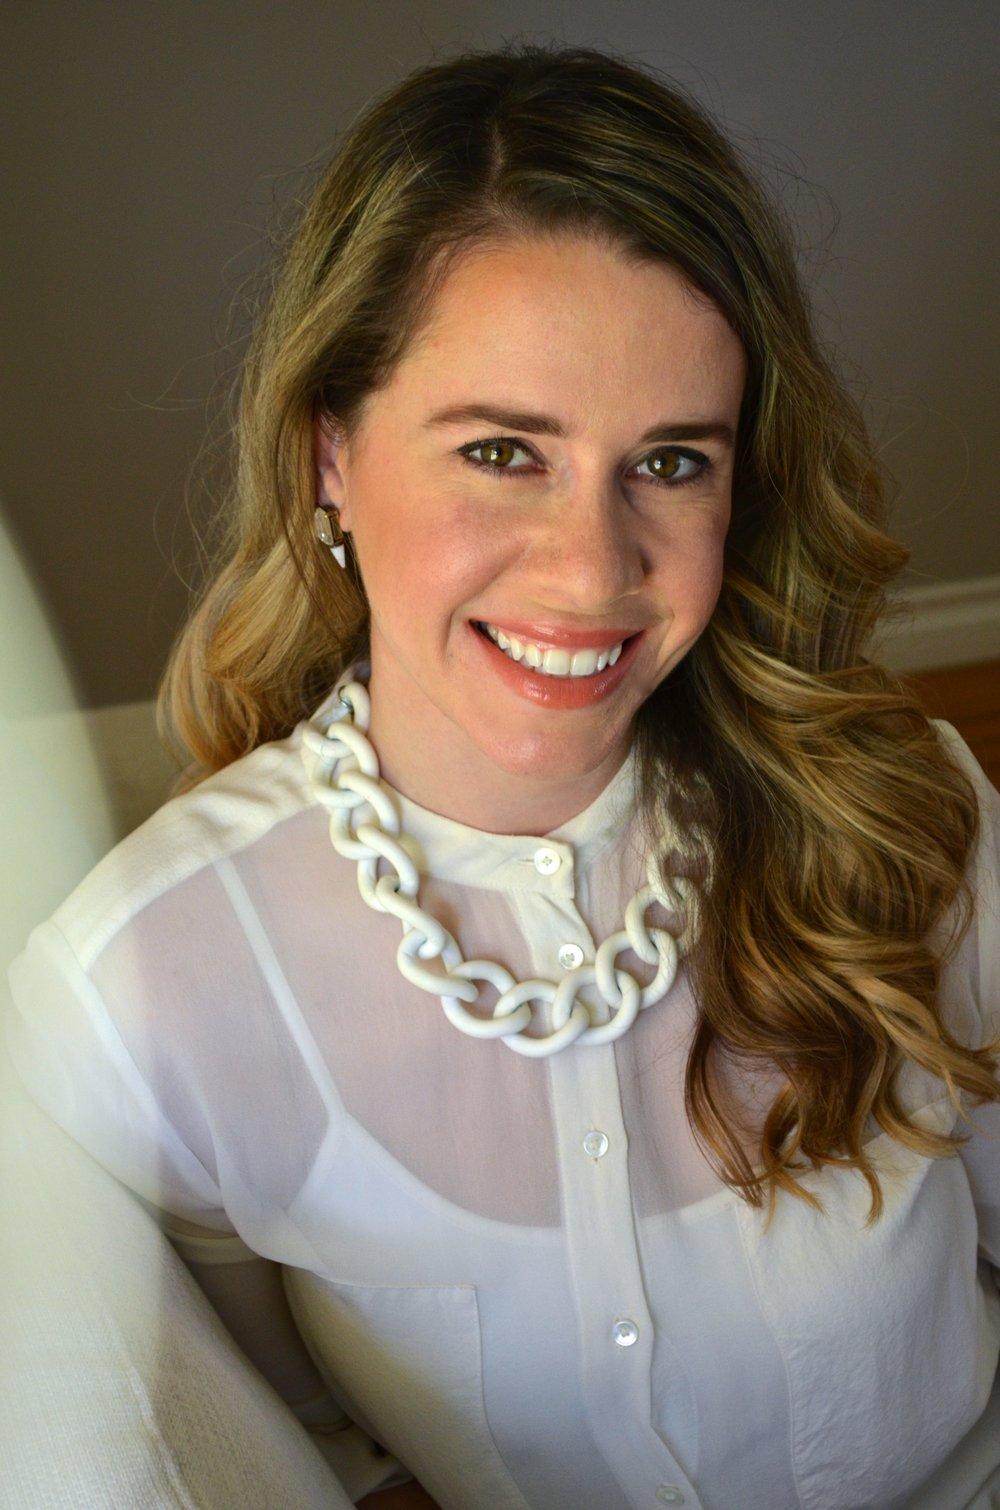 Larissa Dundon public relations